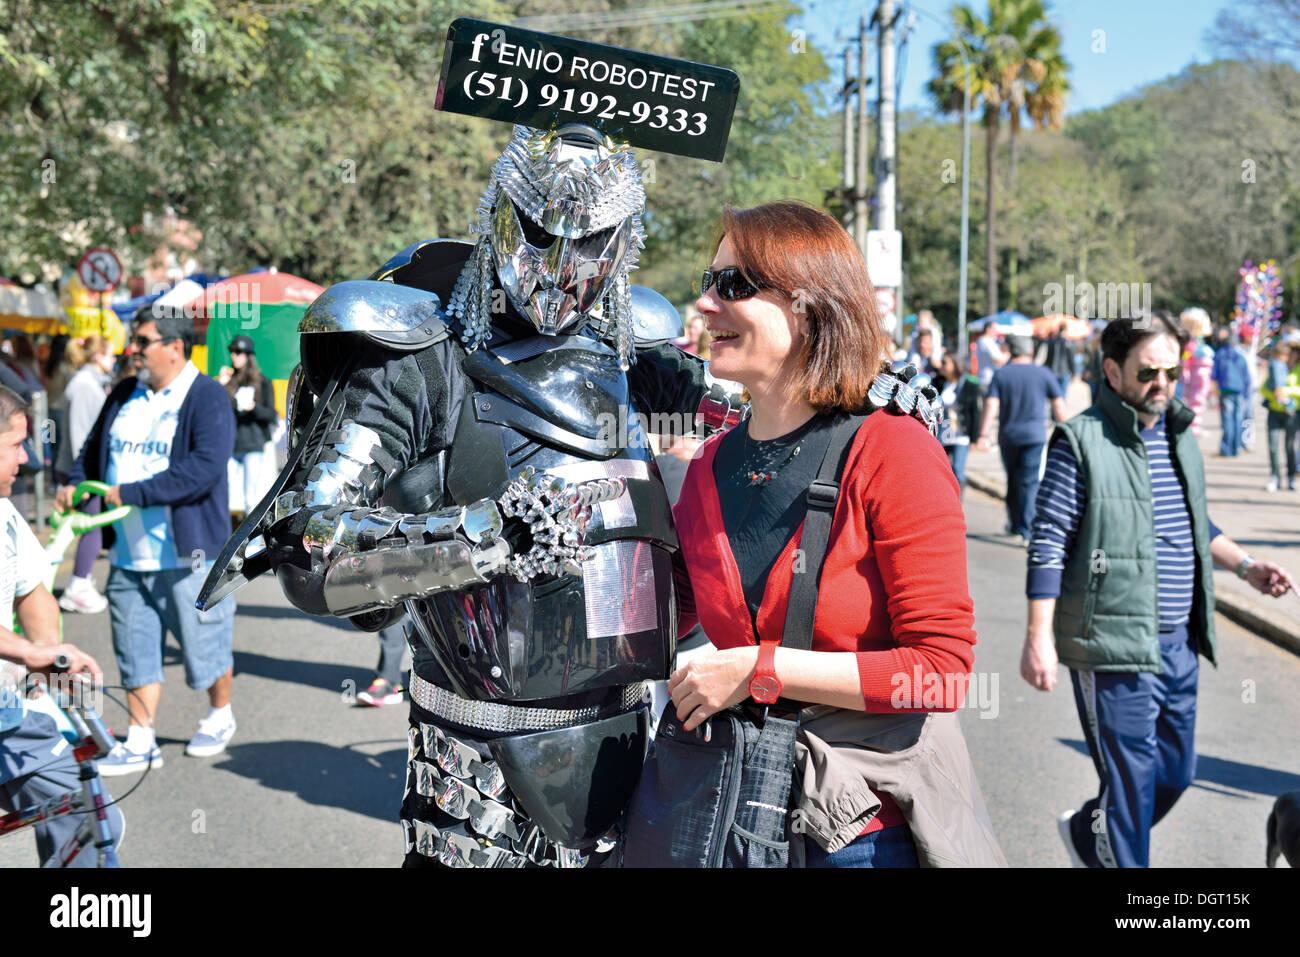 Brazil, Porto Alegre; Making fun with the Robot-Man at sunday open air market 'Brique da Redencao' - Stock Image